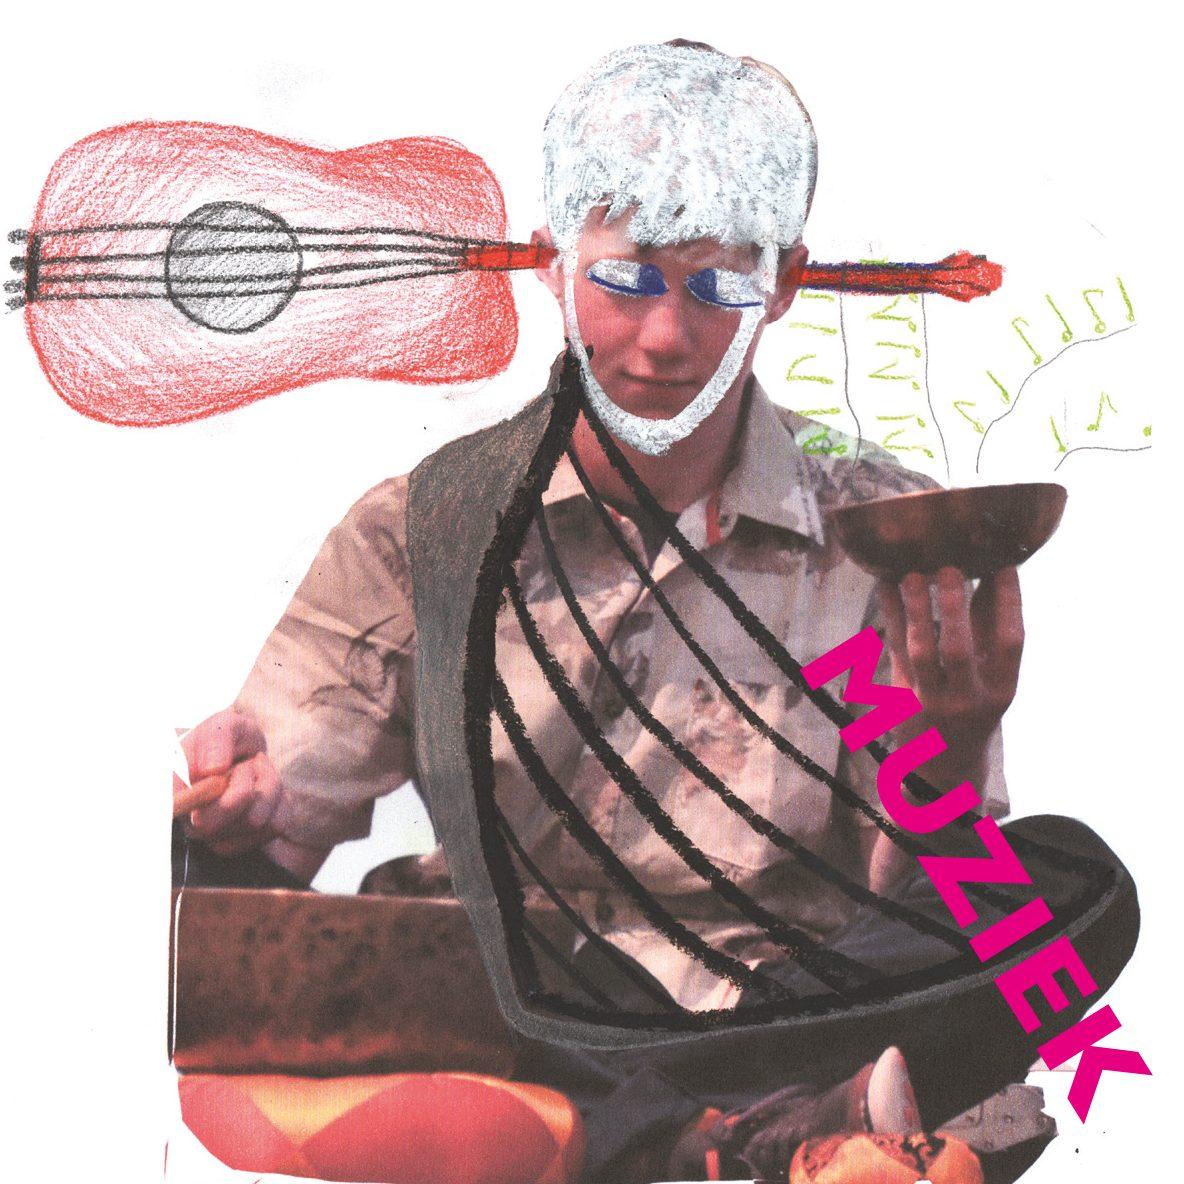 folder_muzeliere-muziek